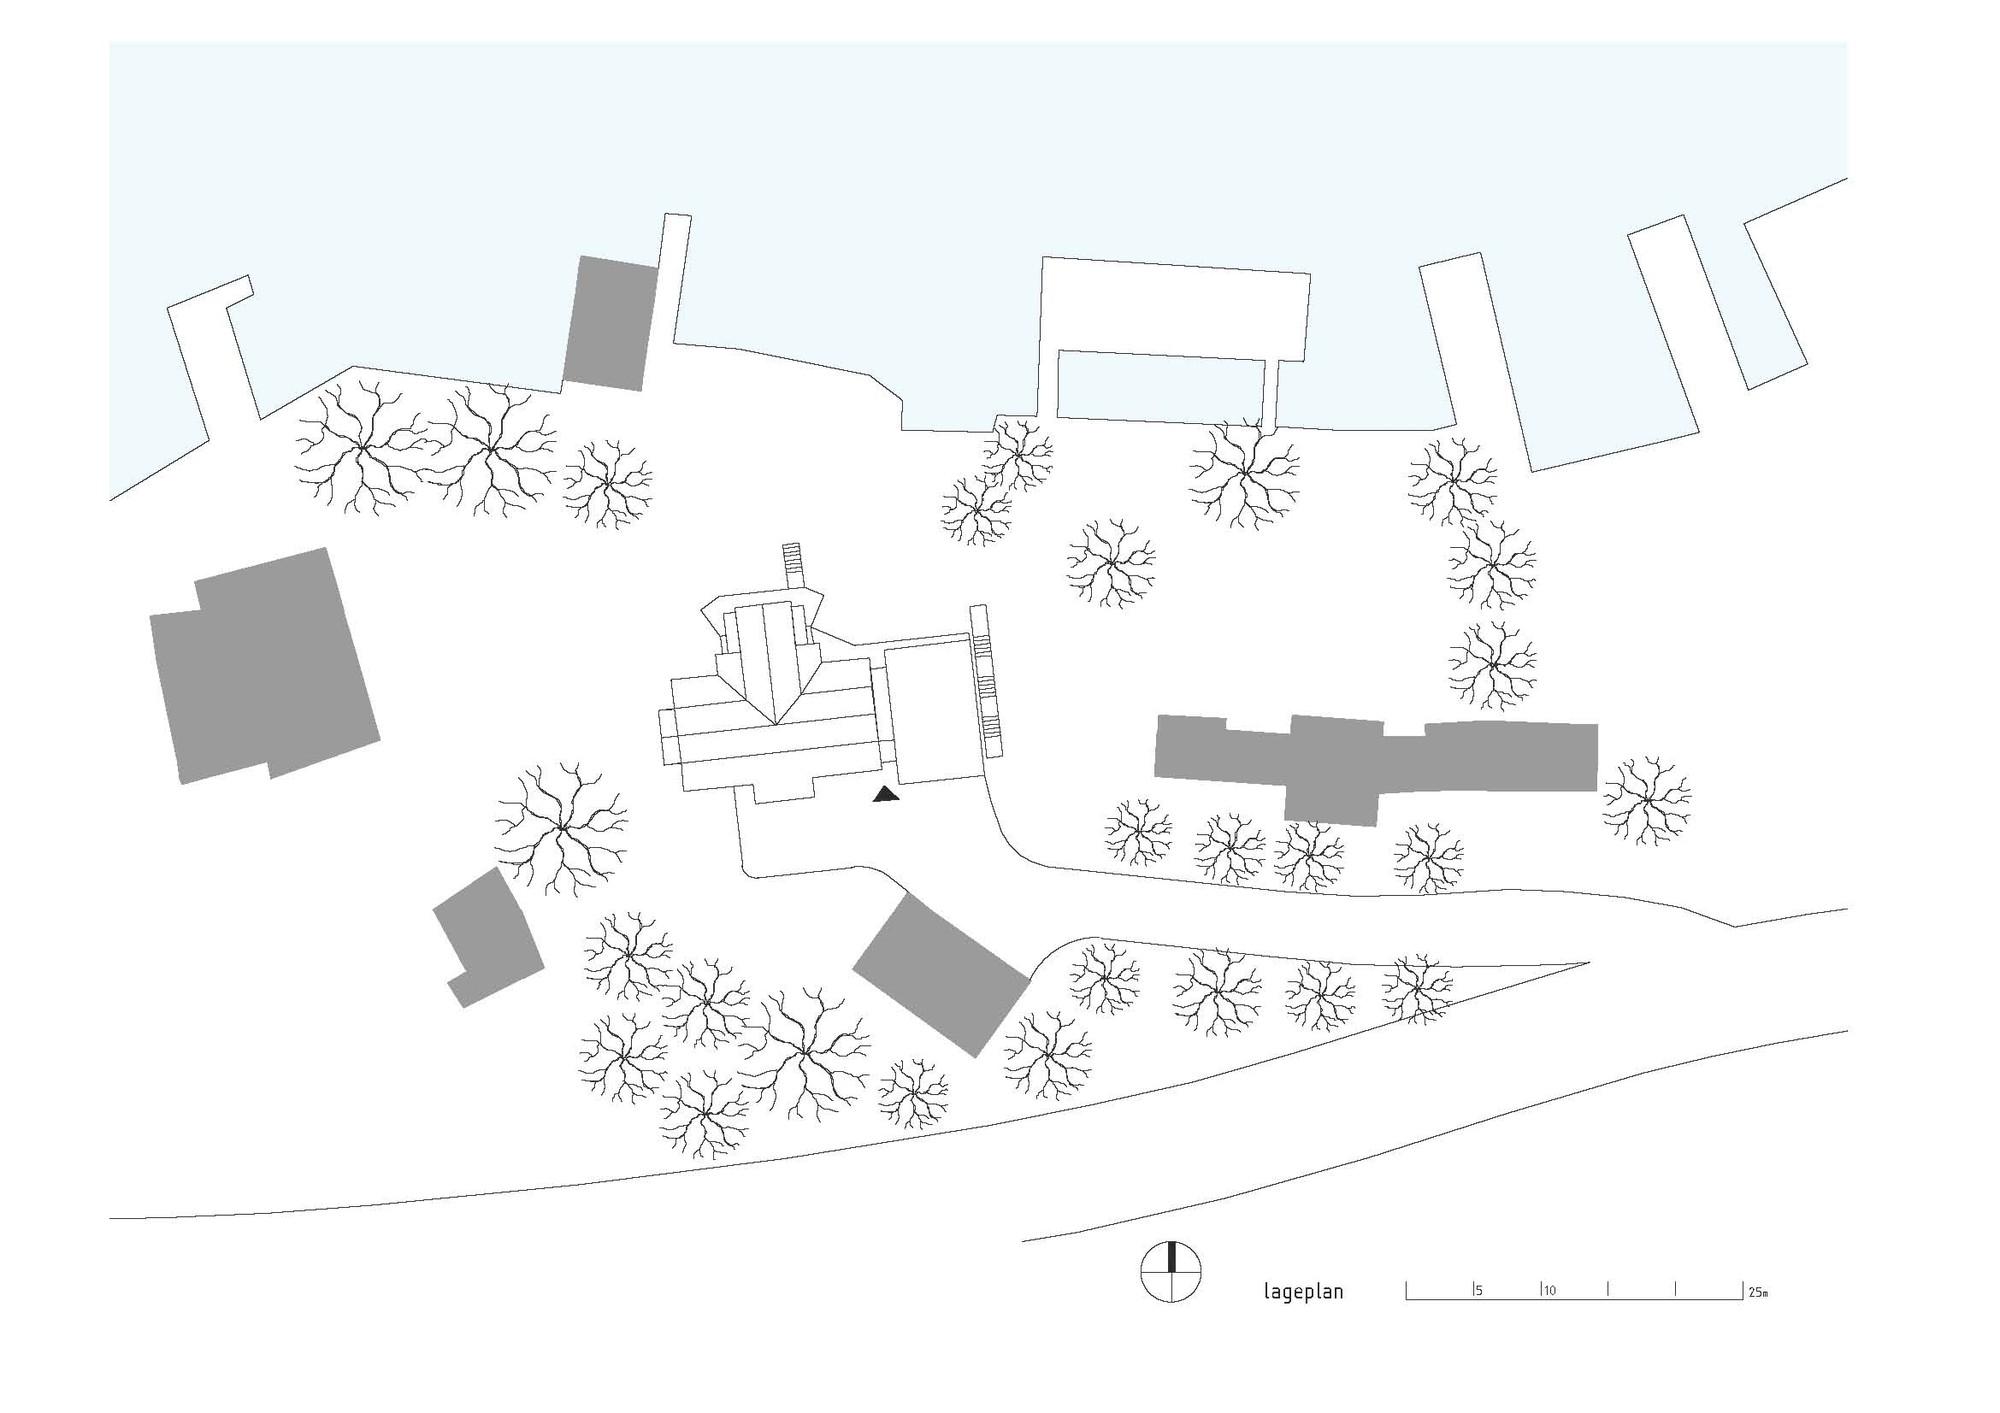 Haus Am See / Spado Architects. 21 / 25. Site Plan